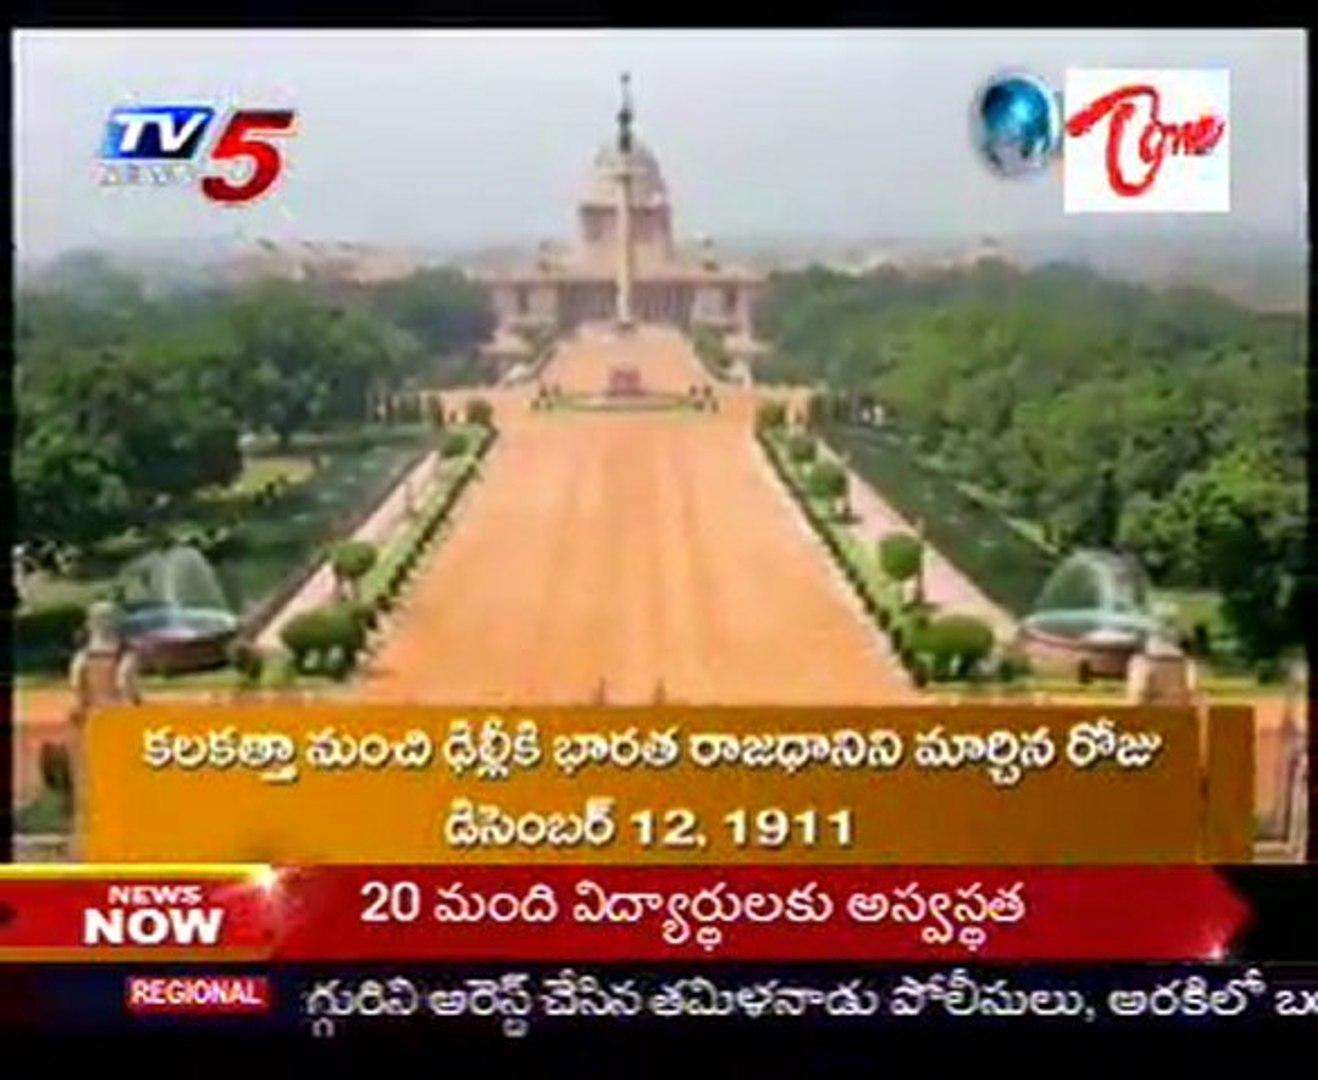 In 1911 India's Capital shifted from Calcutta to Delhi